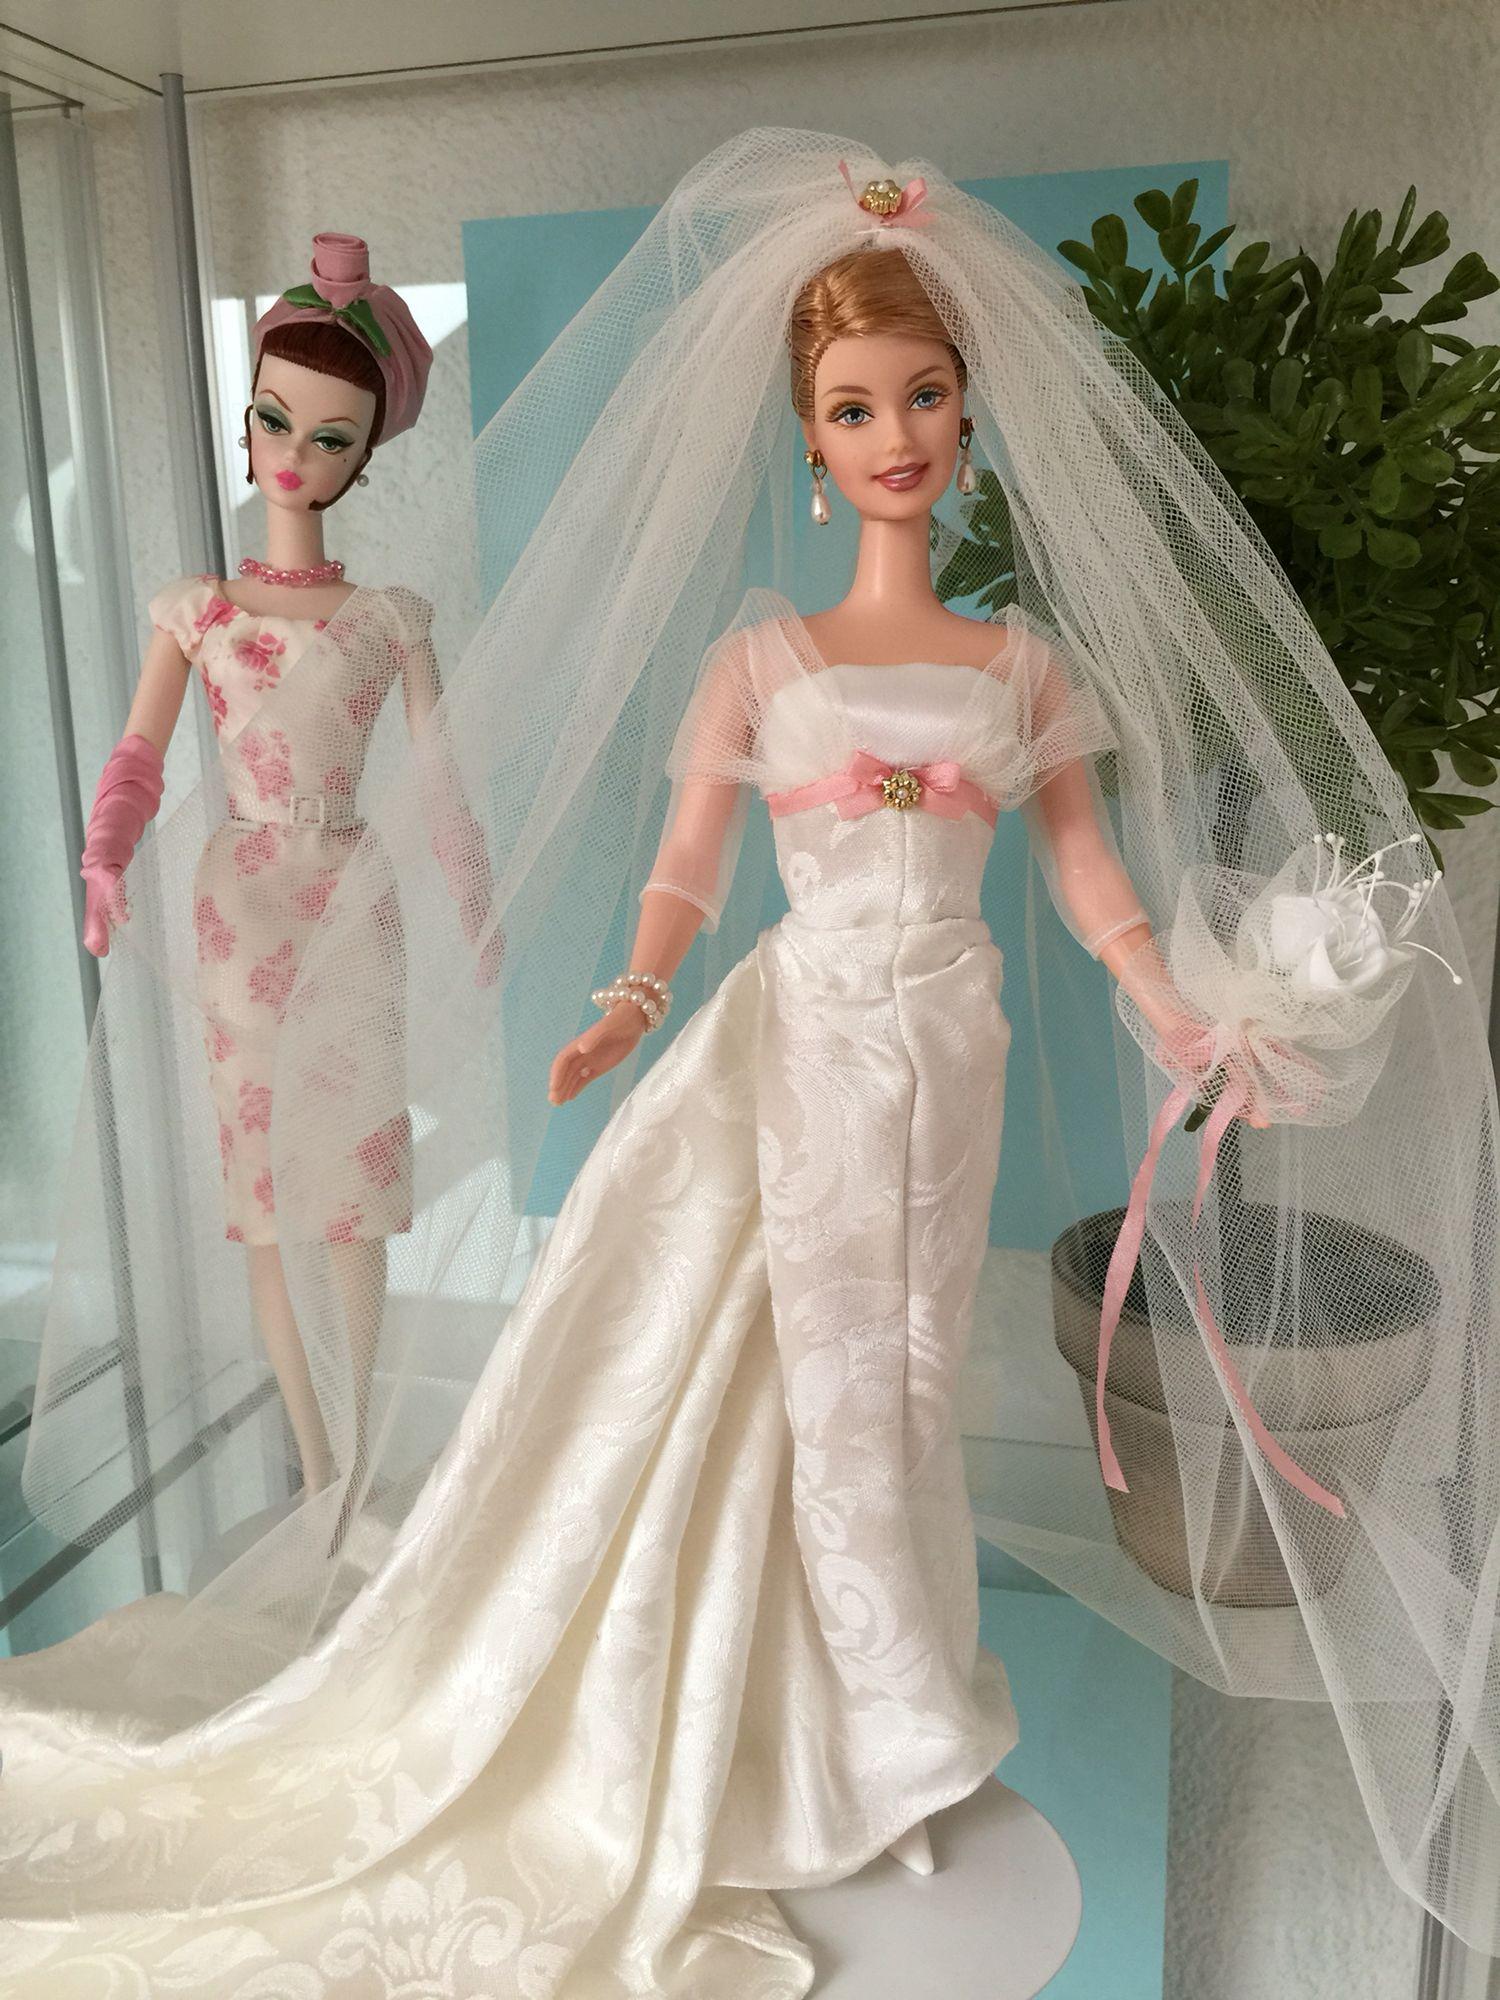 Pin by Angel on My Barbie Showcases  Barbie wedding dress, Barbie